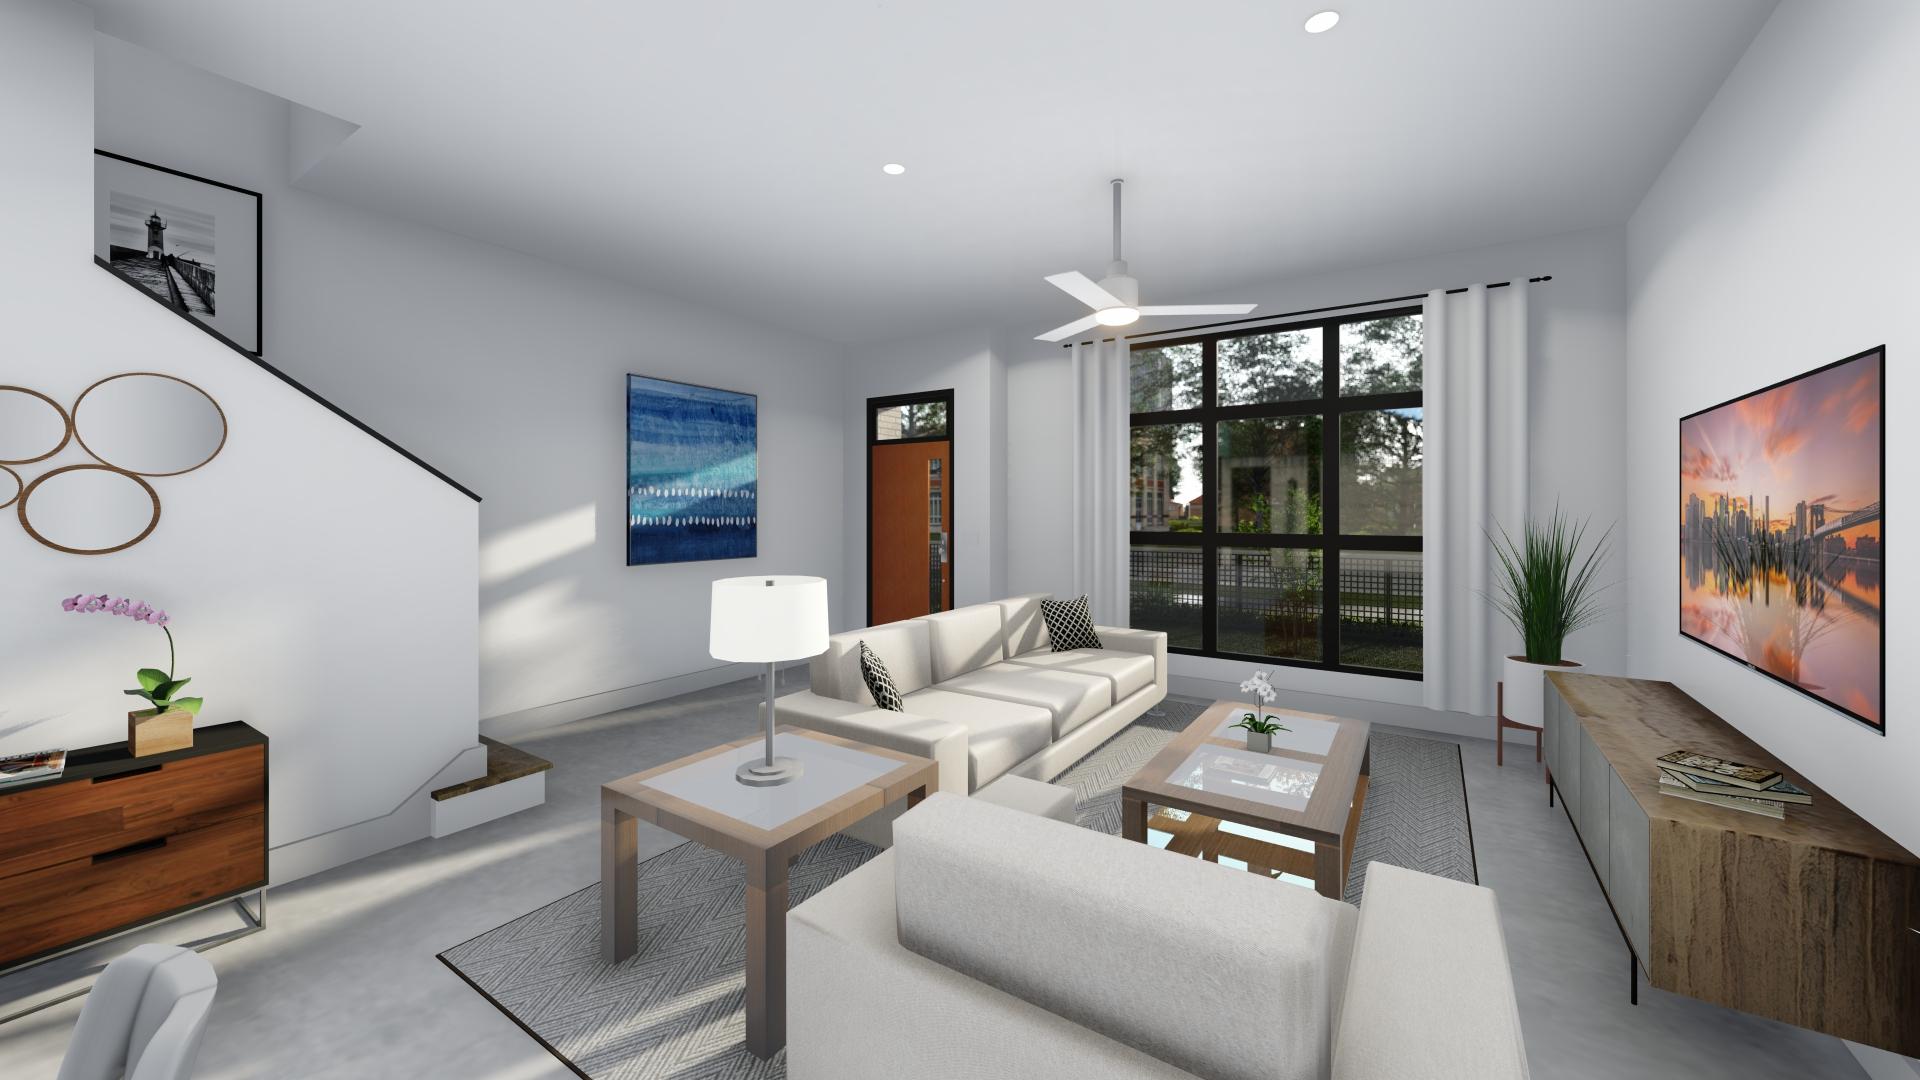 New Wayside interior rendering_Photo - 5.jpg